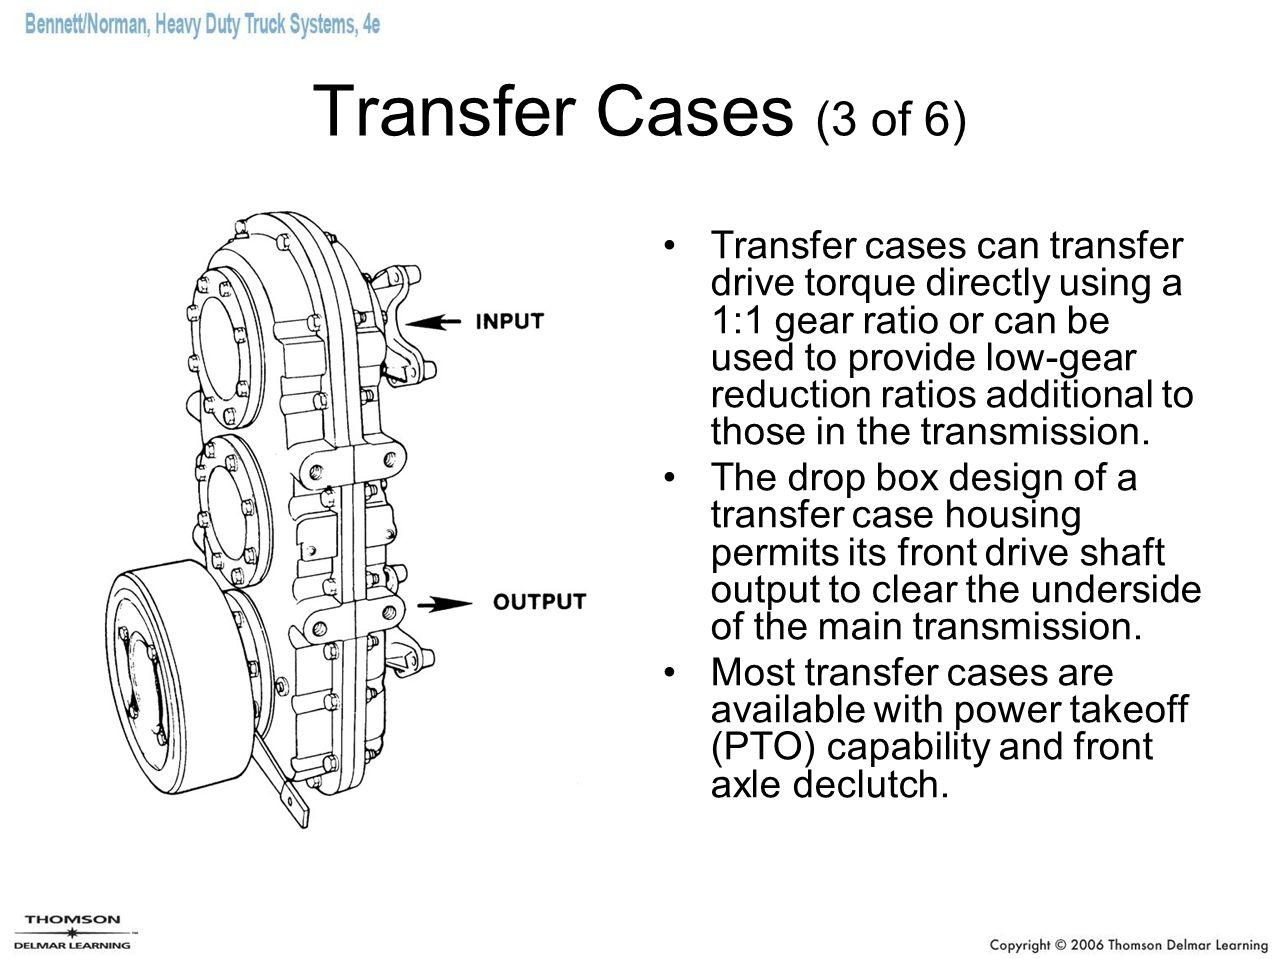 Transfer Cases (3 of 6)